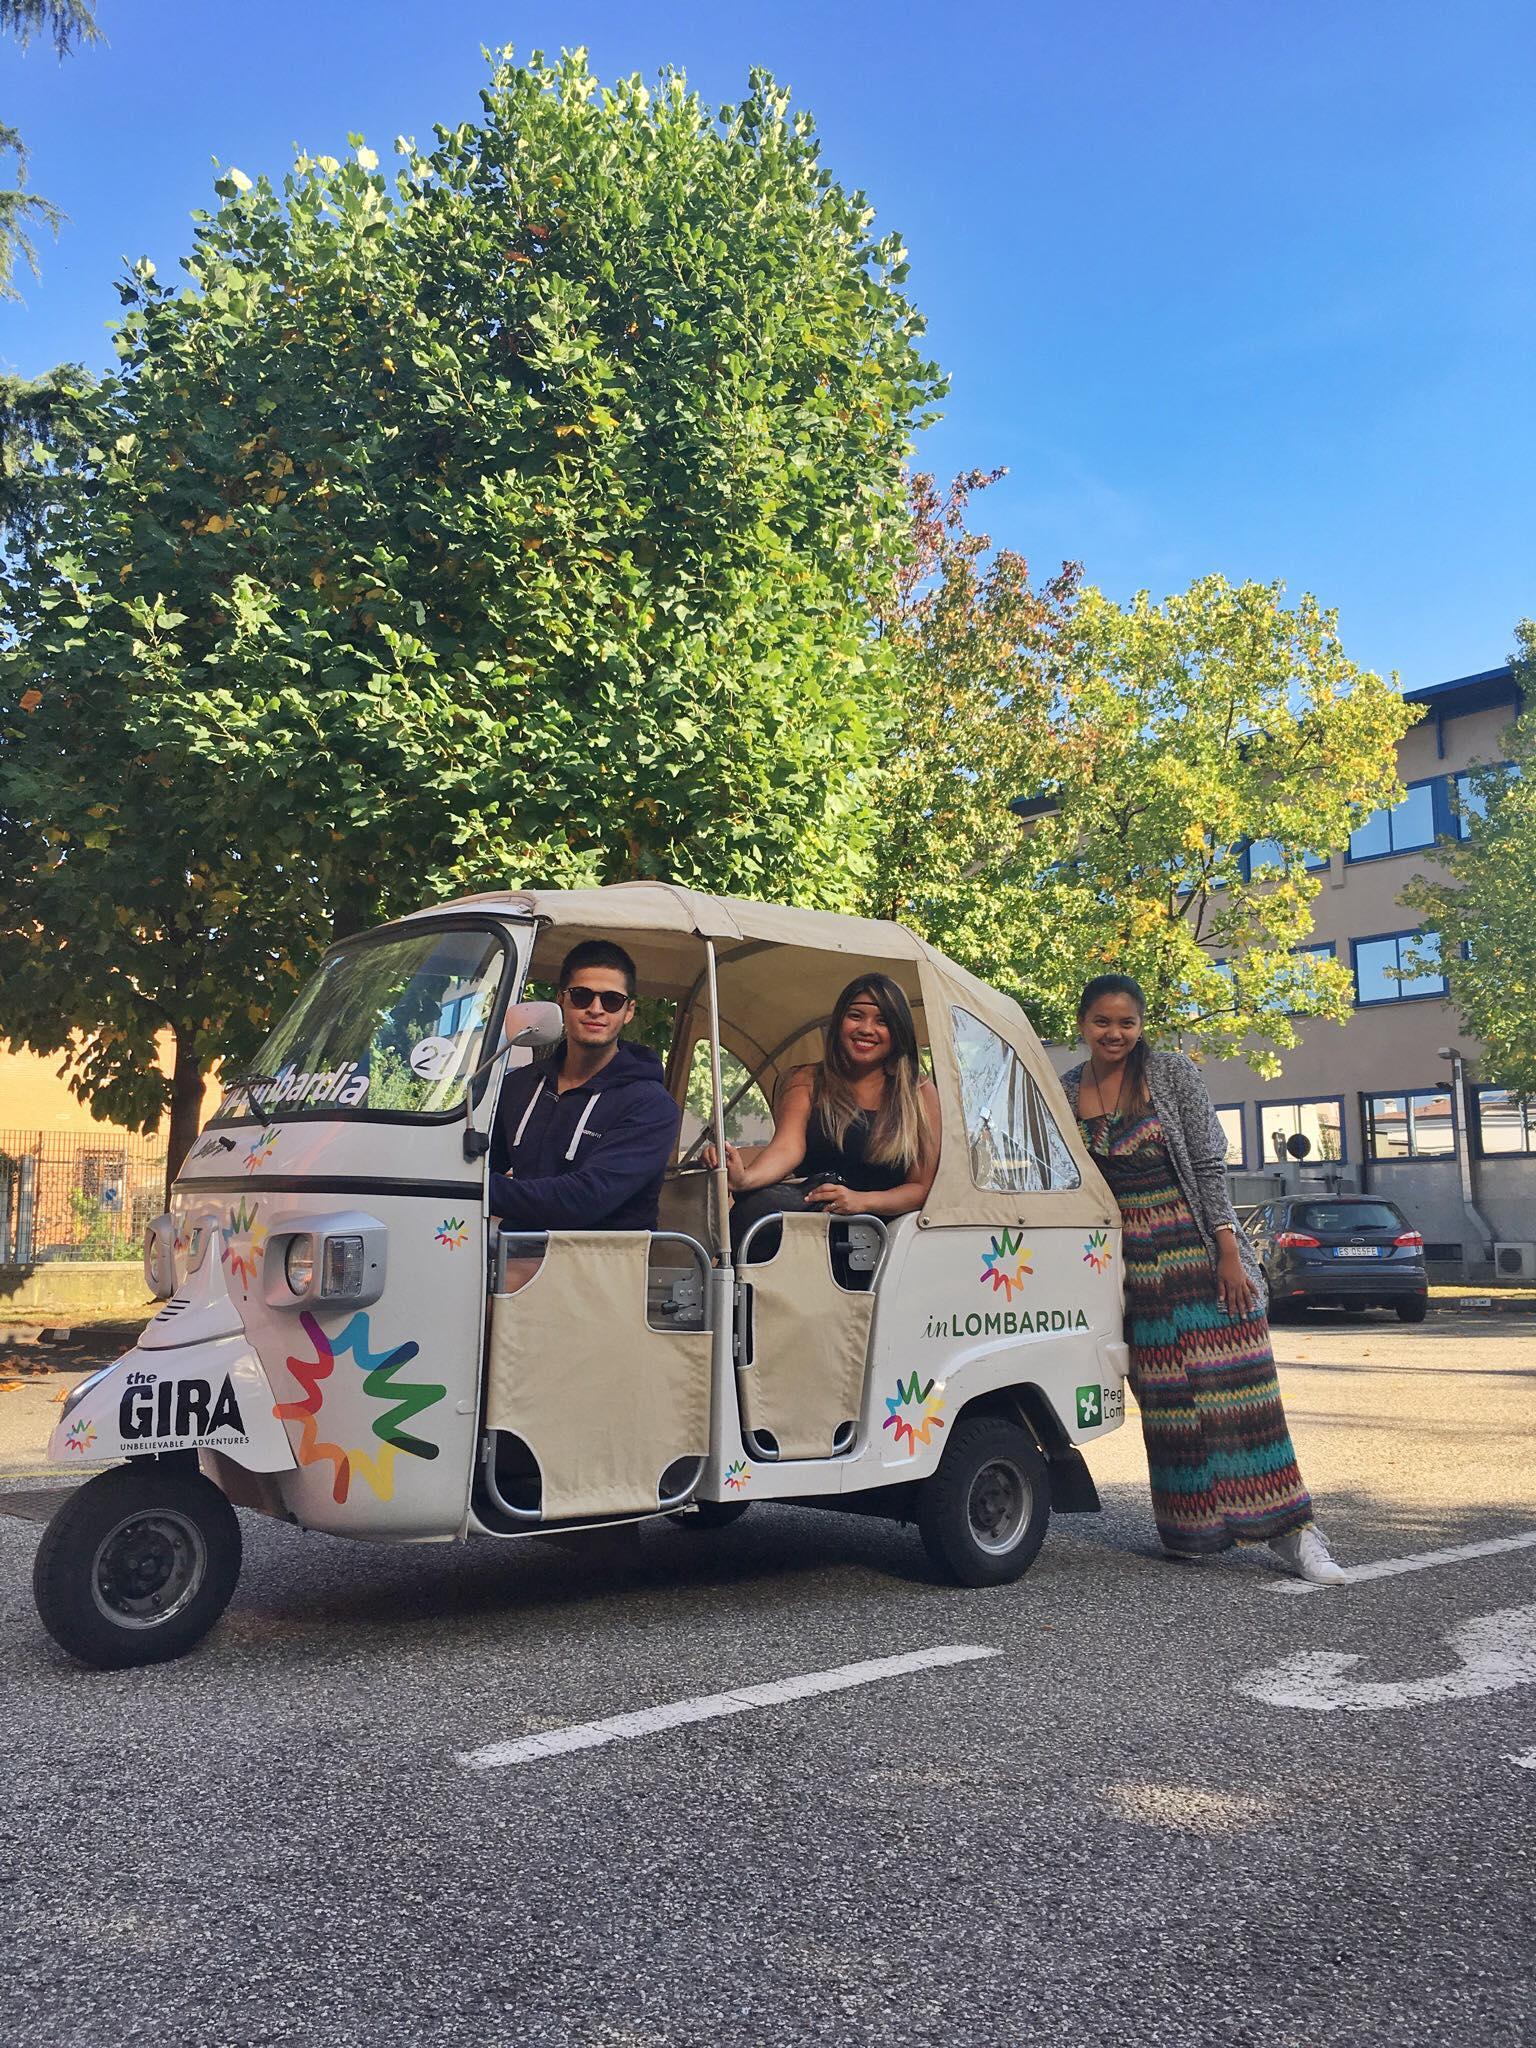 Roadtrip around Lombardy, Region in North Italy - Tuktuk in Lombar